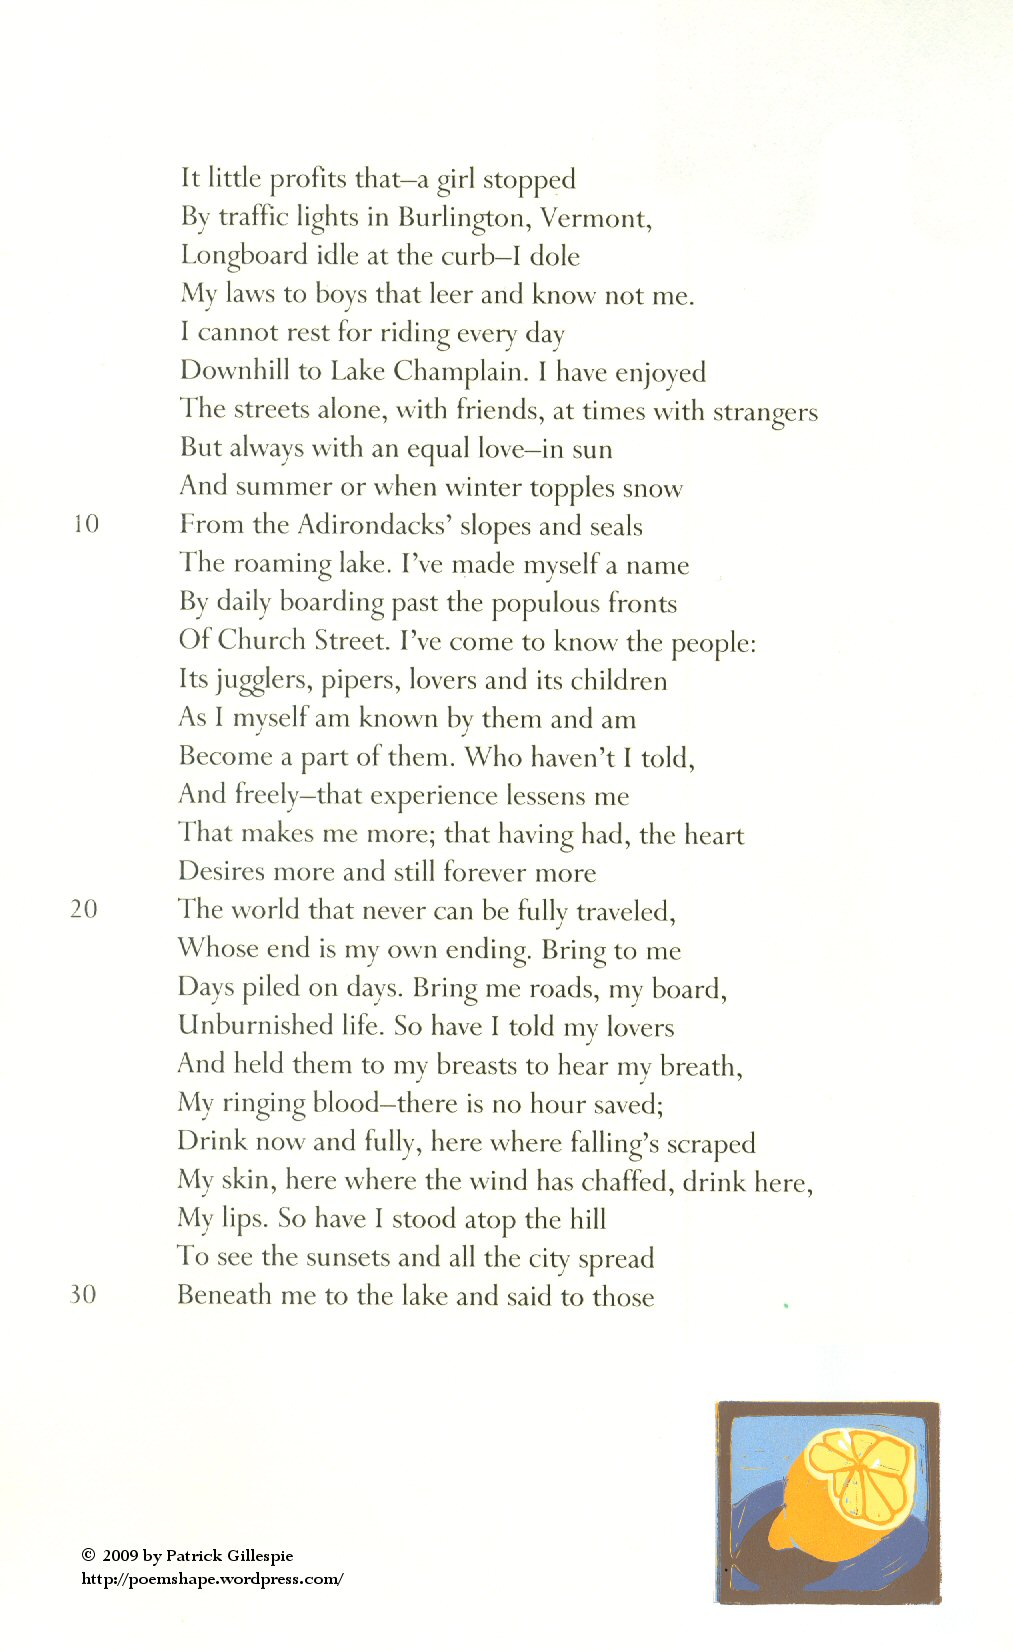 ulysses-longboard-page-1-lemon